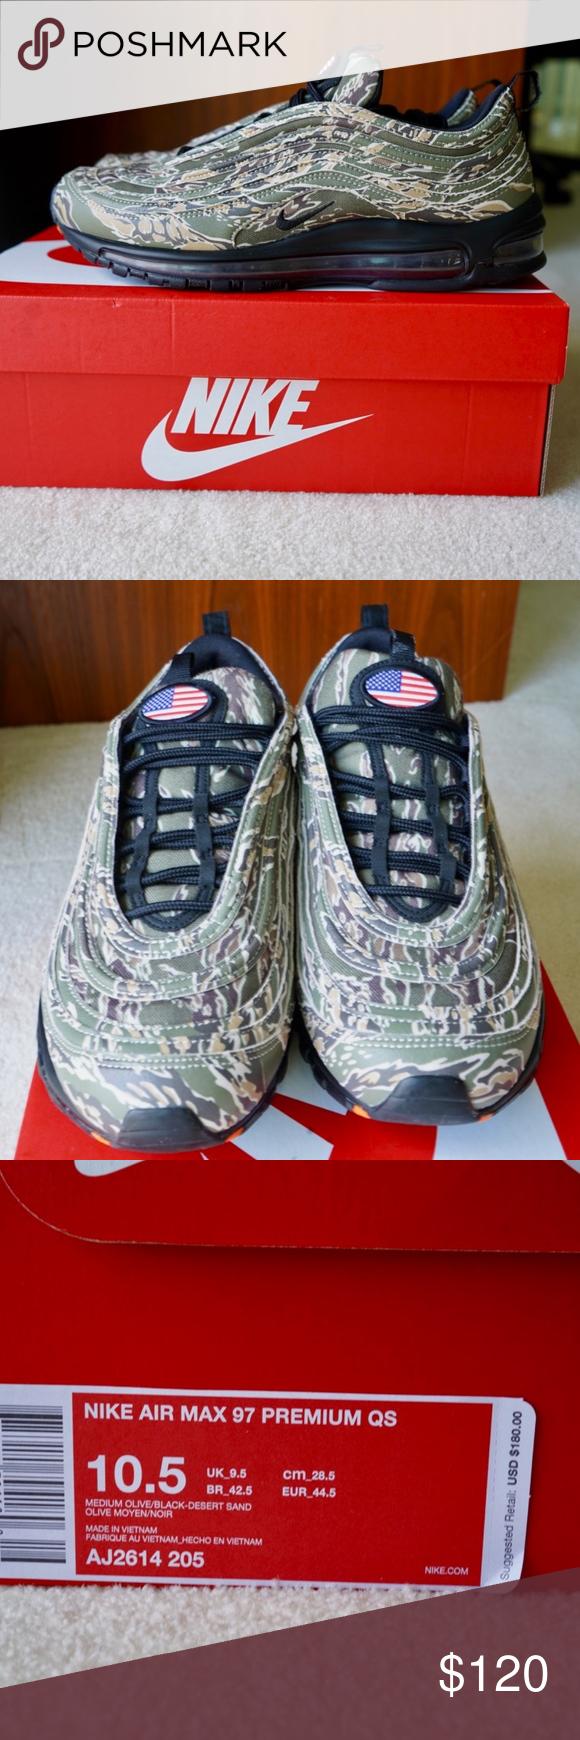 92ba475fa6 Nike Air Max 97 Premium QS USA Camo Pre-owned with box. Worn casually